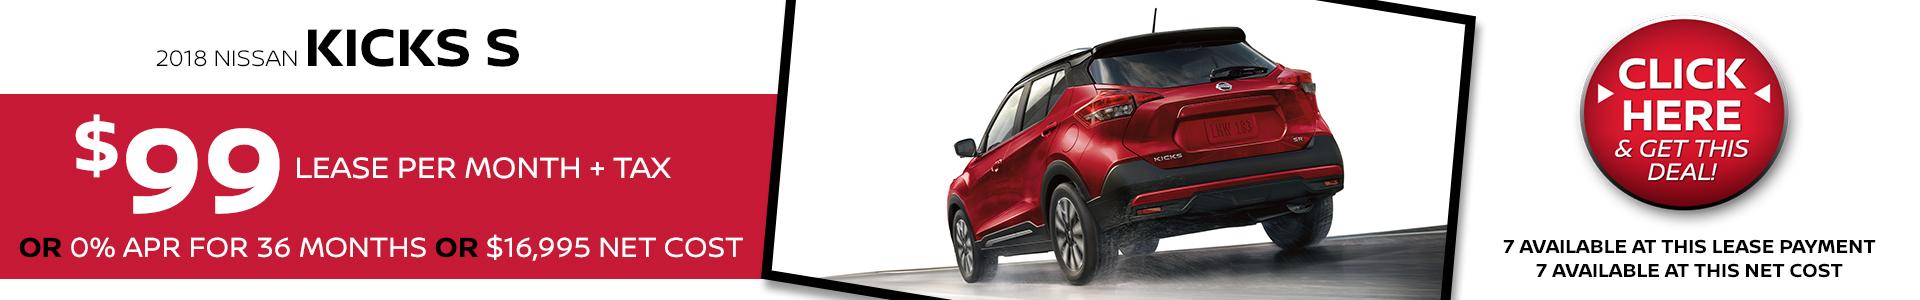 Mossy Nissan - Nissan Kicks $99 Lease